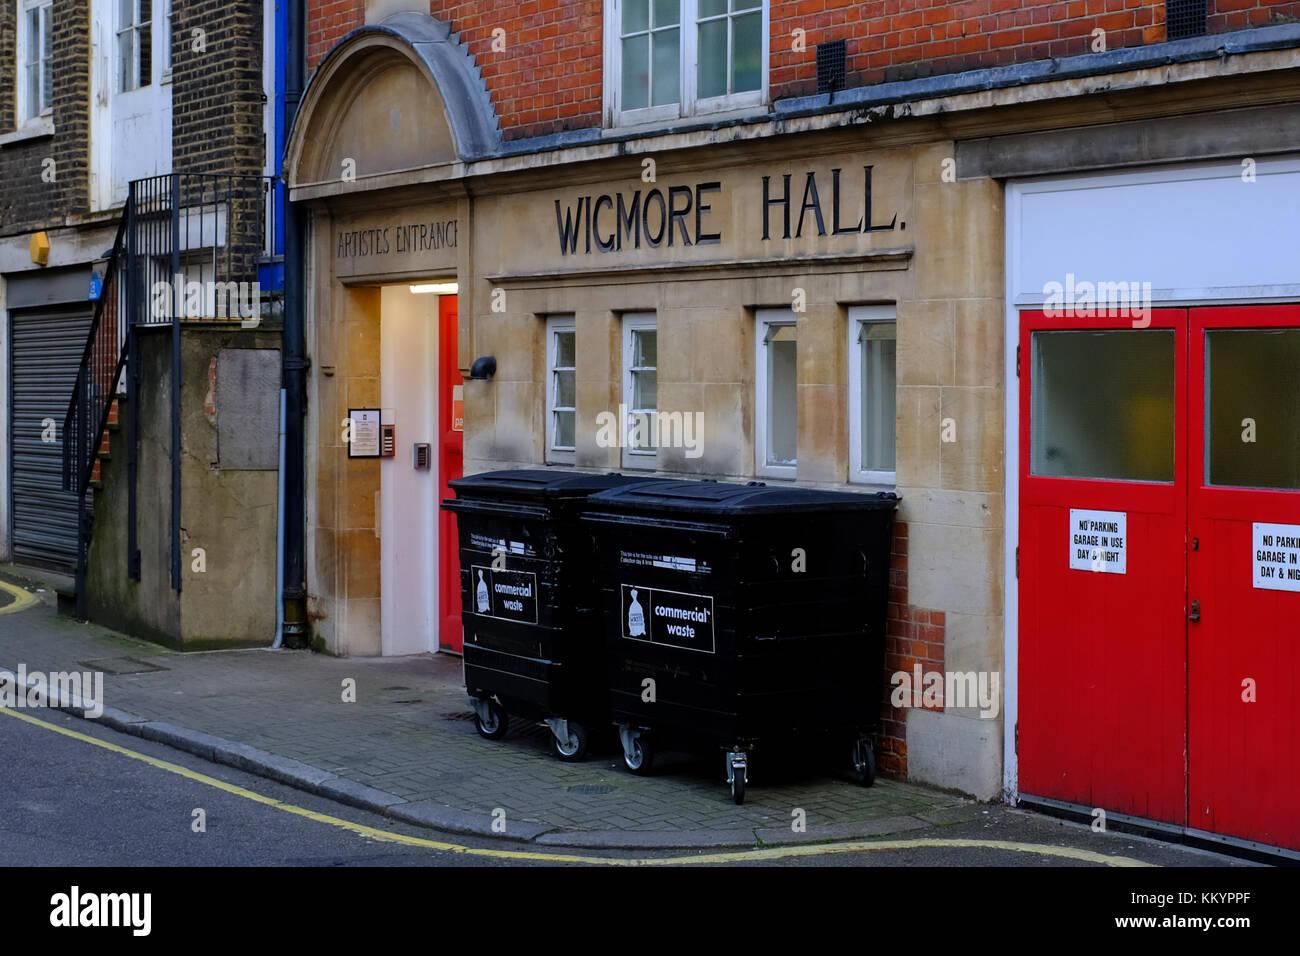 Wigmore Hall Artistes Entrance, Welbeck way, Marylebone, London UK - Stock Image